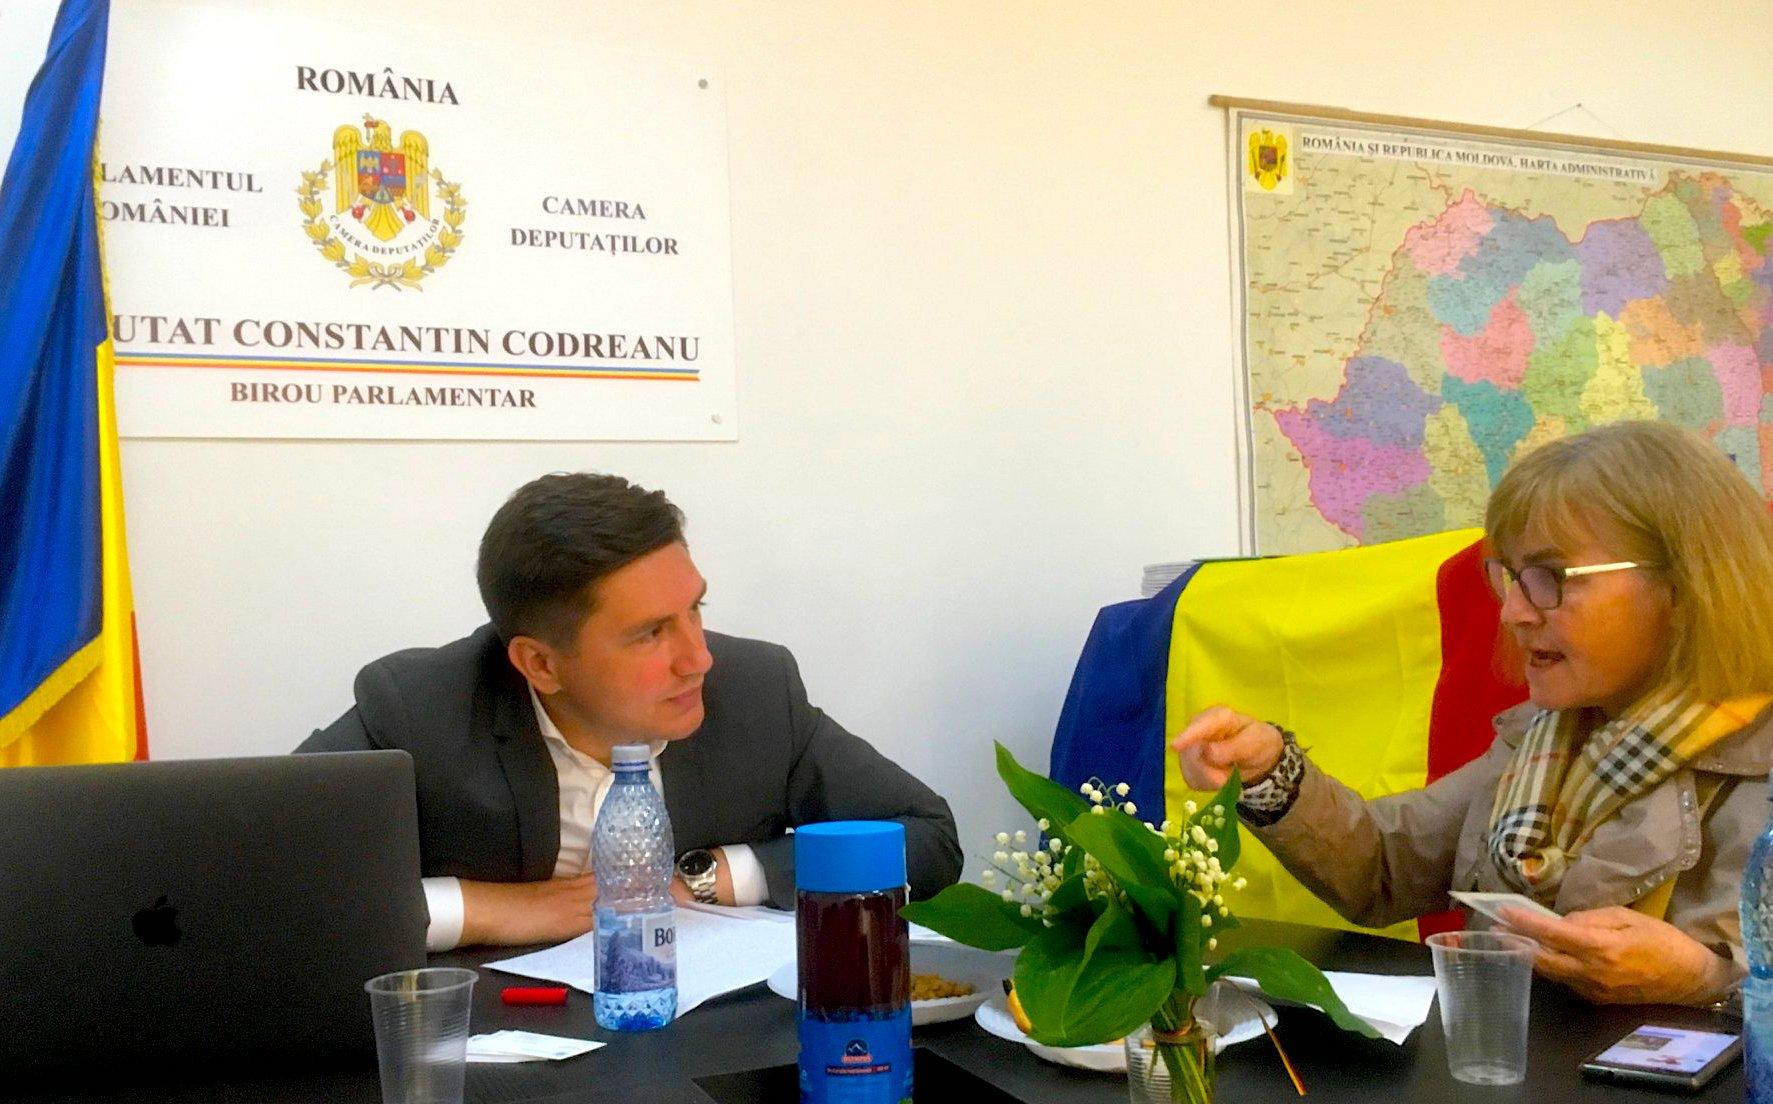 Constantin Codreanu Birou Parlamentar